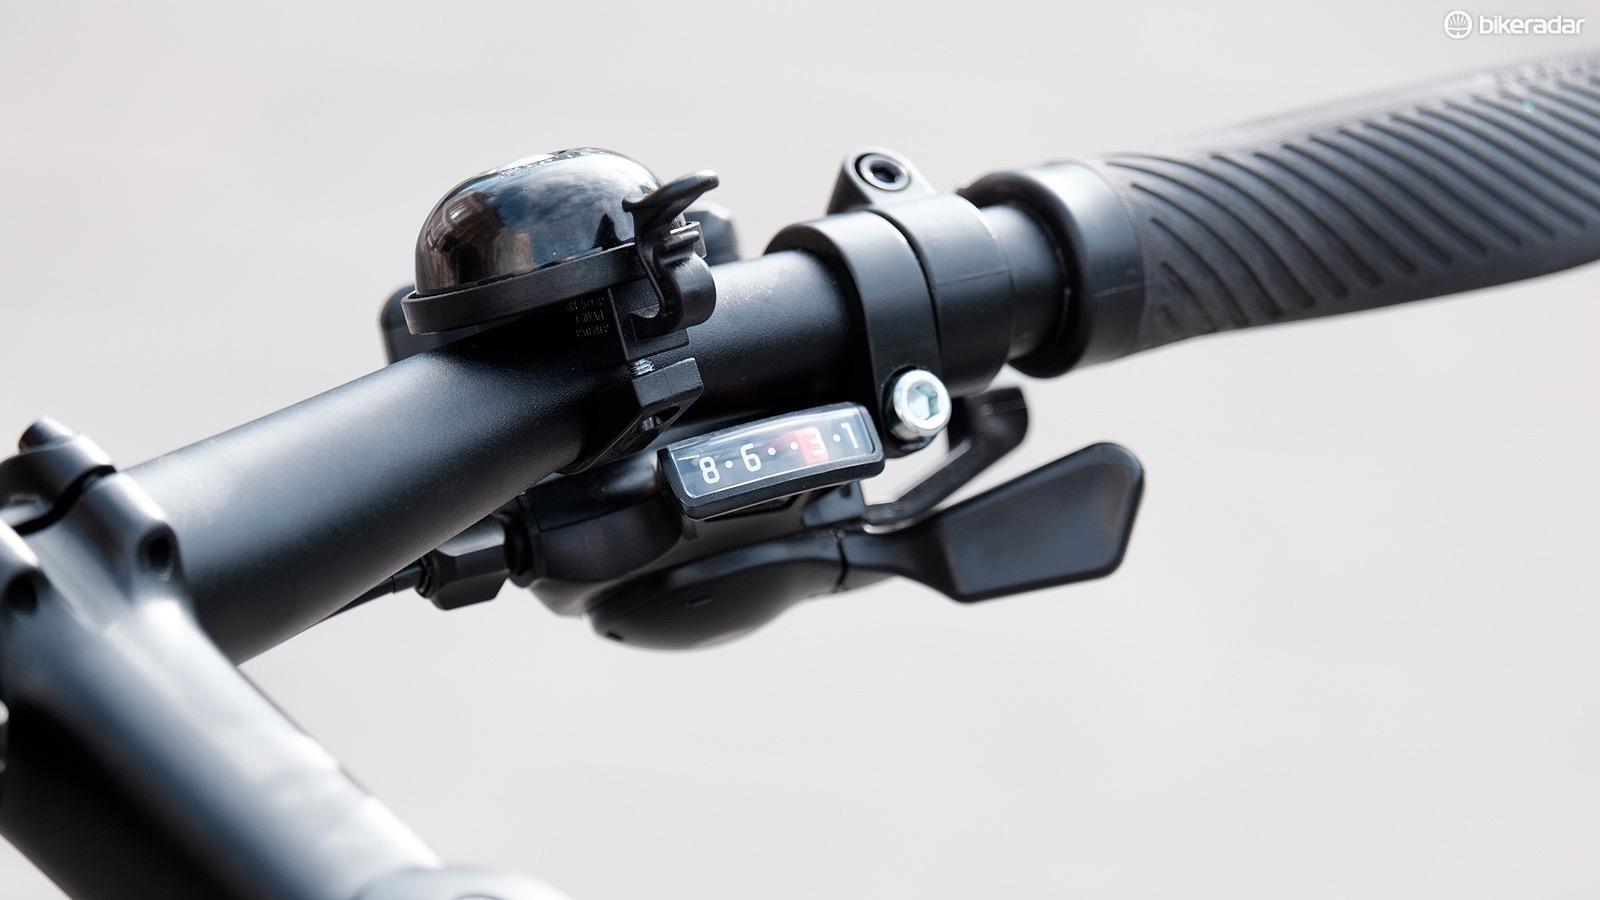 Specialized Sirrus Alloy Disc review - Hybrid Bikes - Bikes